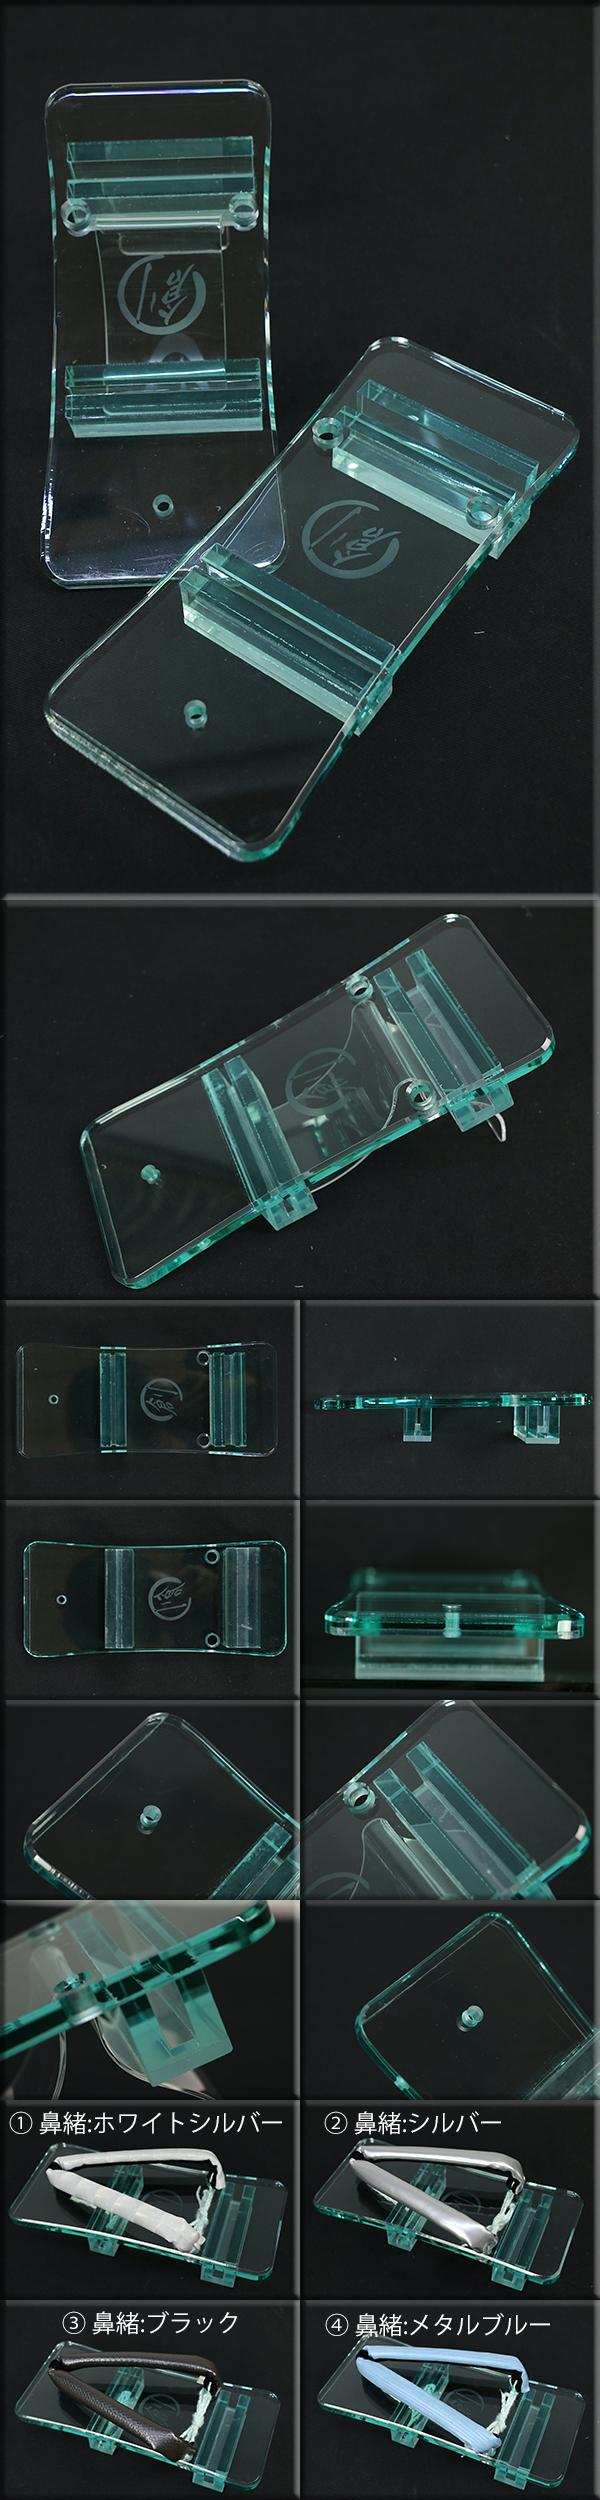 93glass-man0402